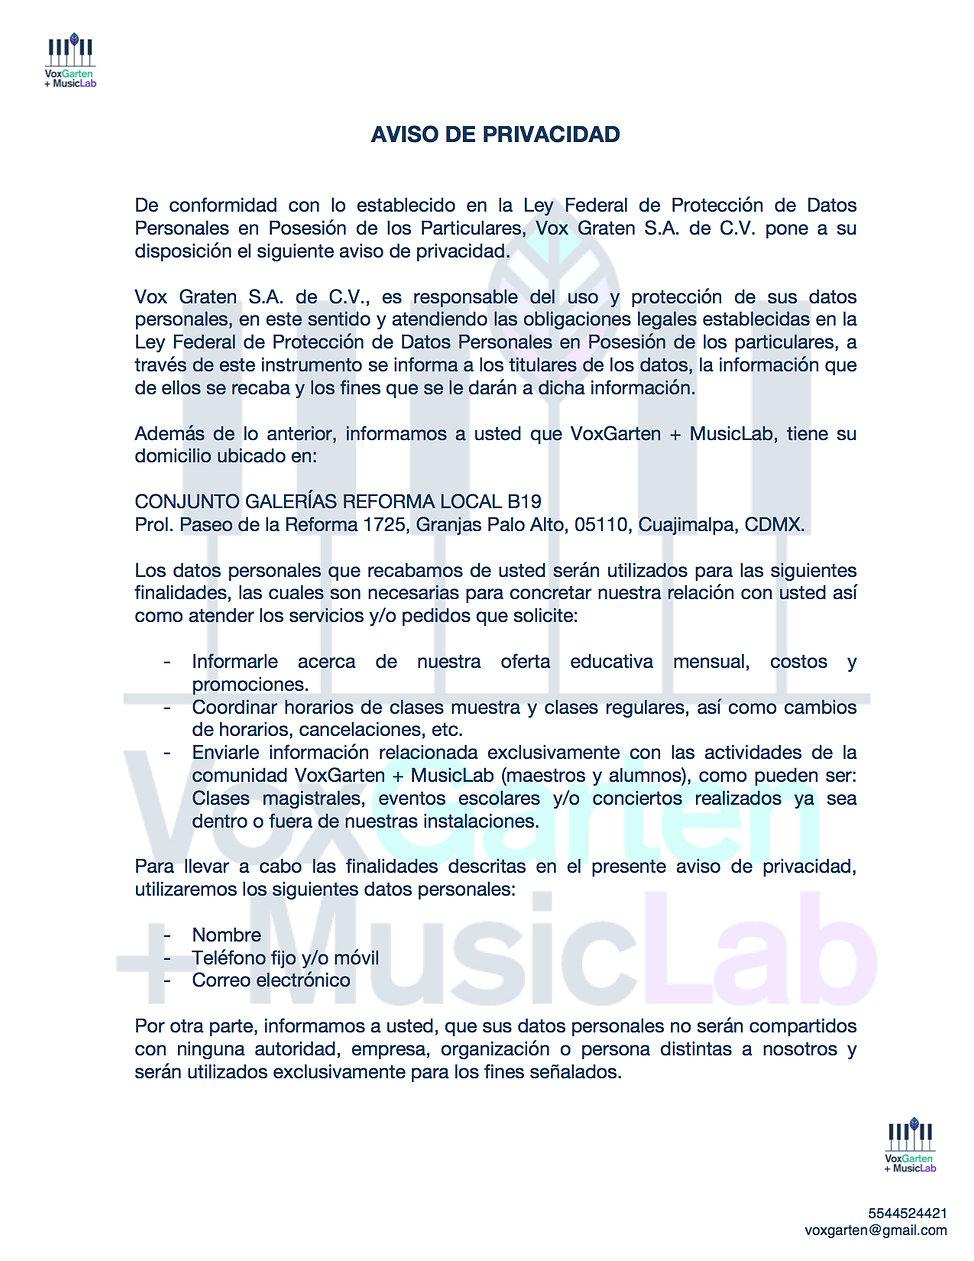 AVISO DE PRIVACIDAD VG+ML1.jpg